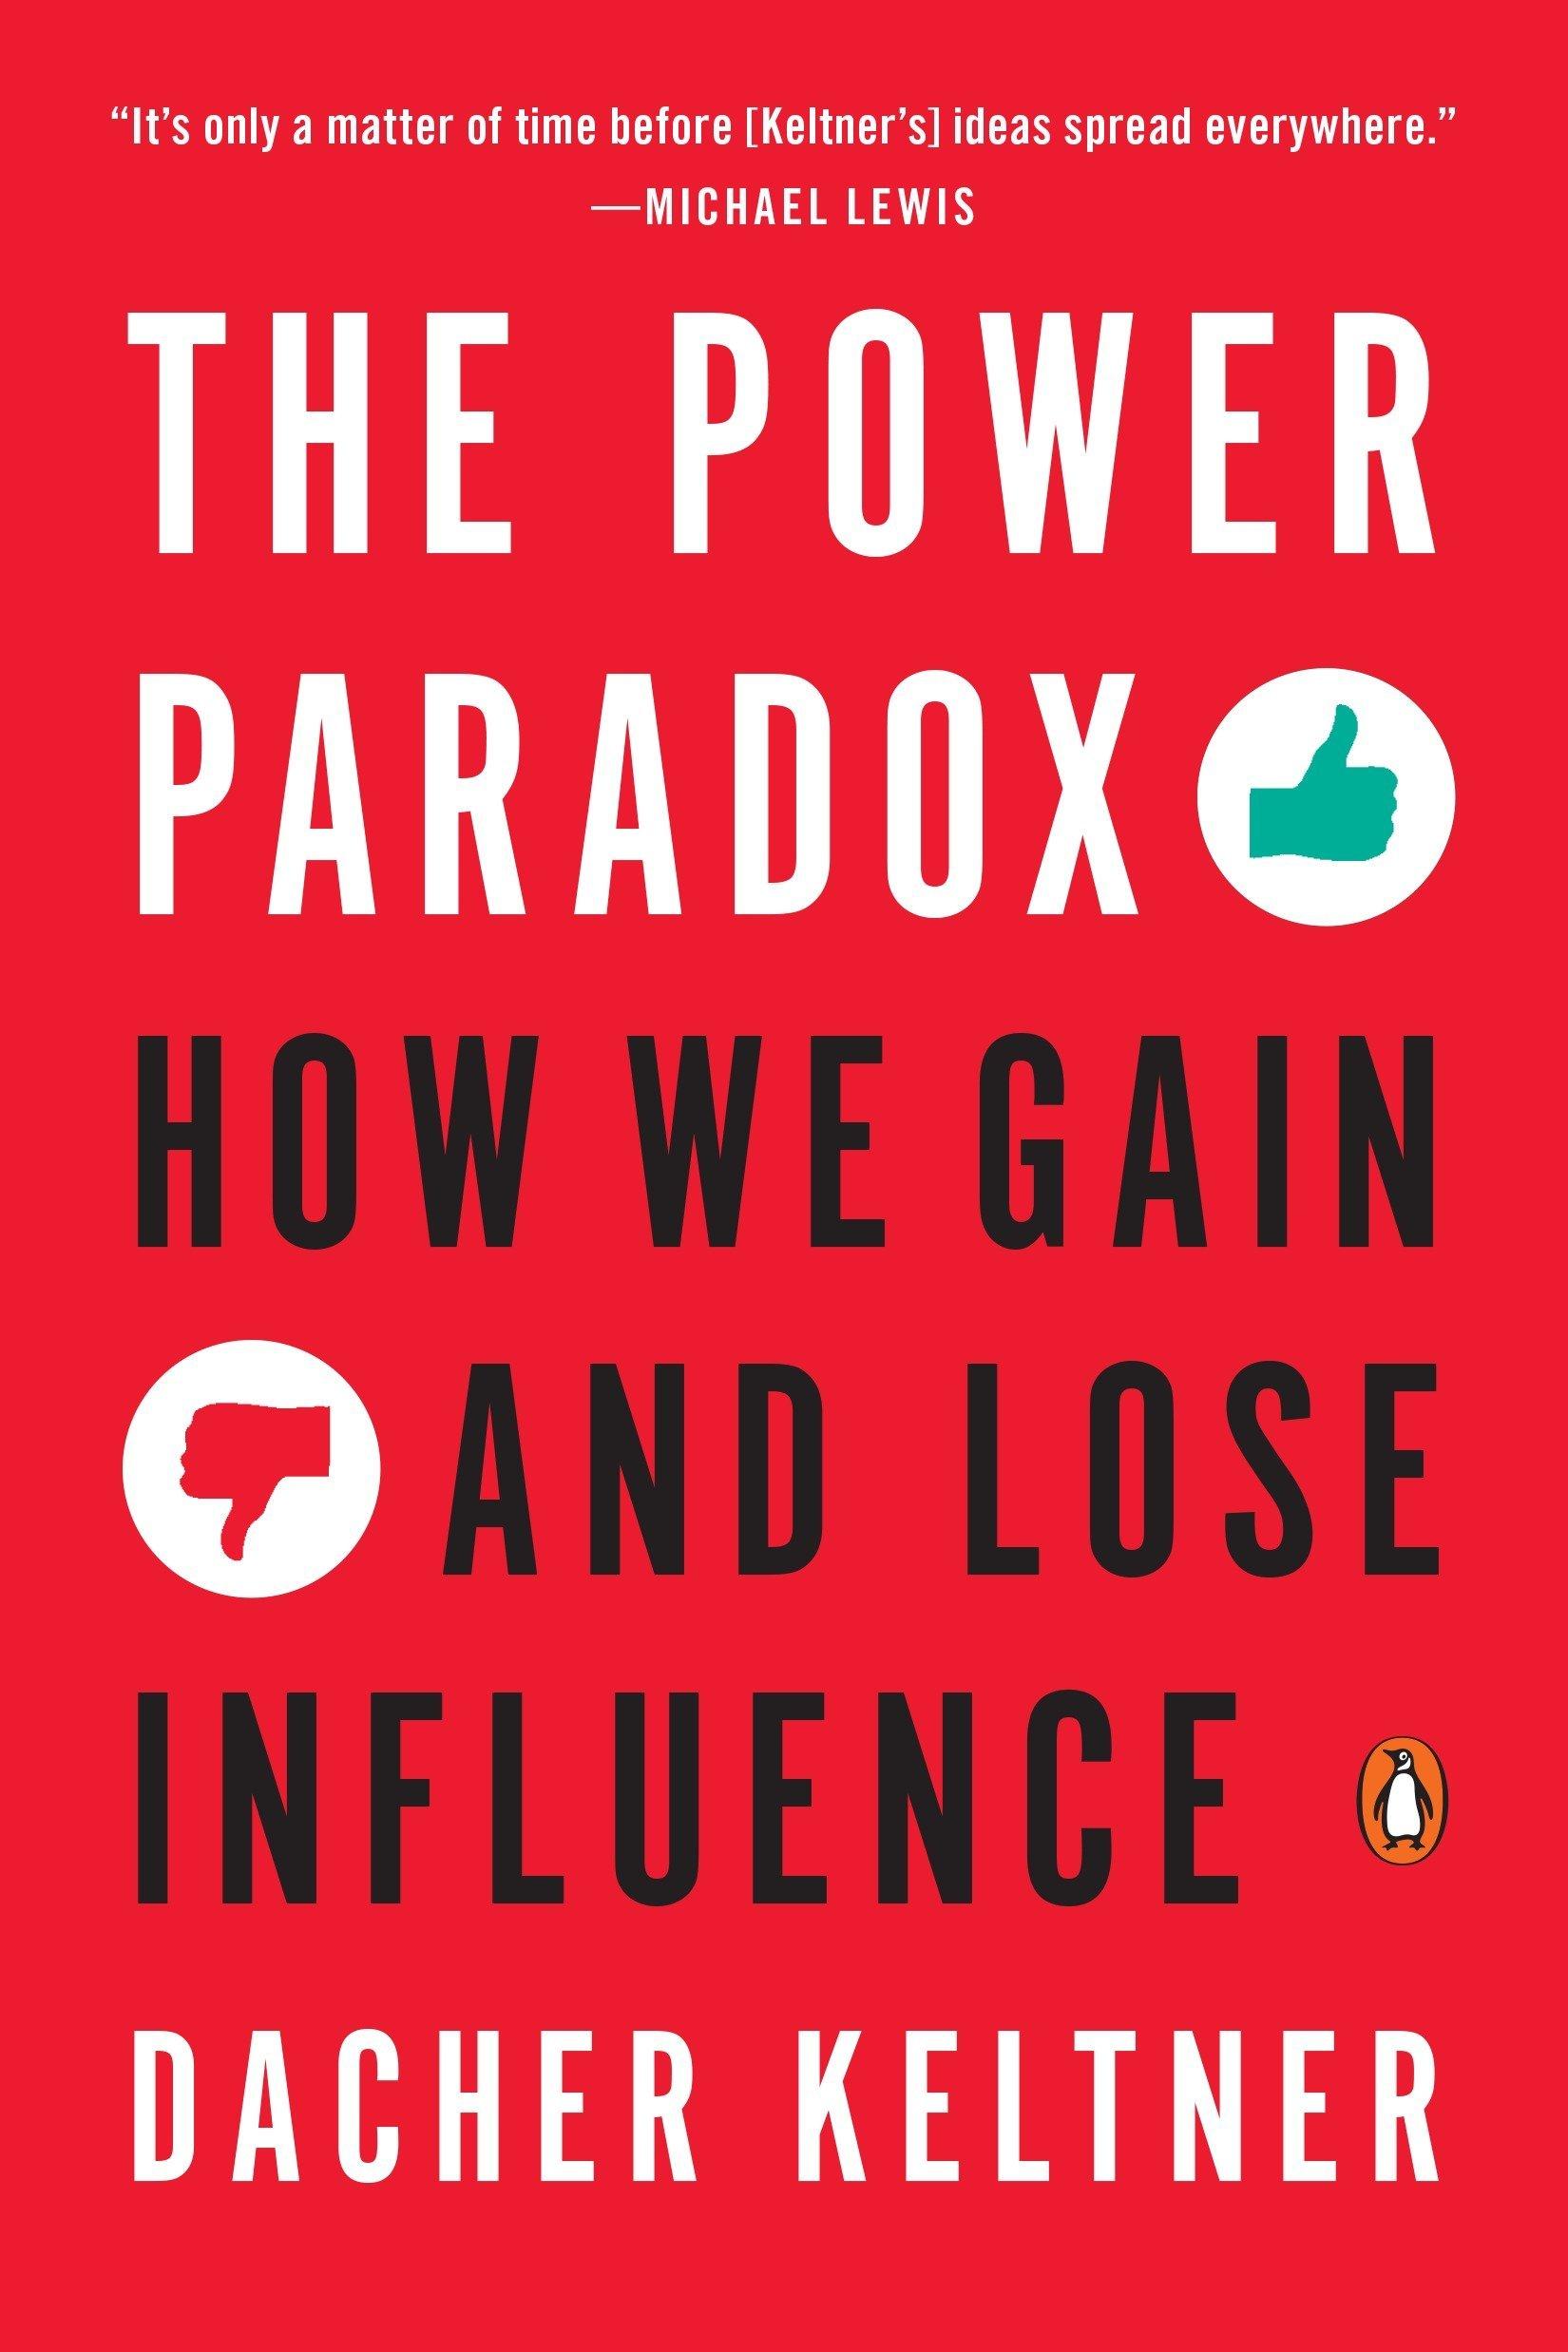 The Power Paradox.jpg